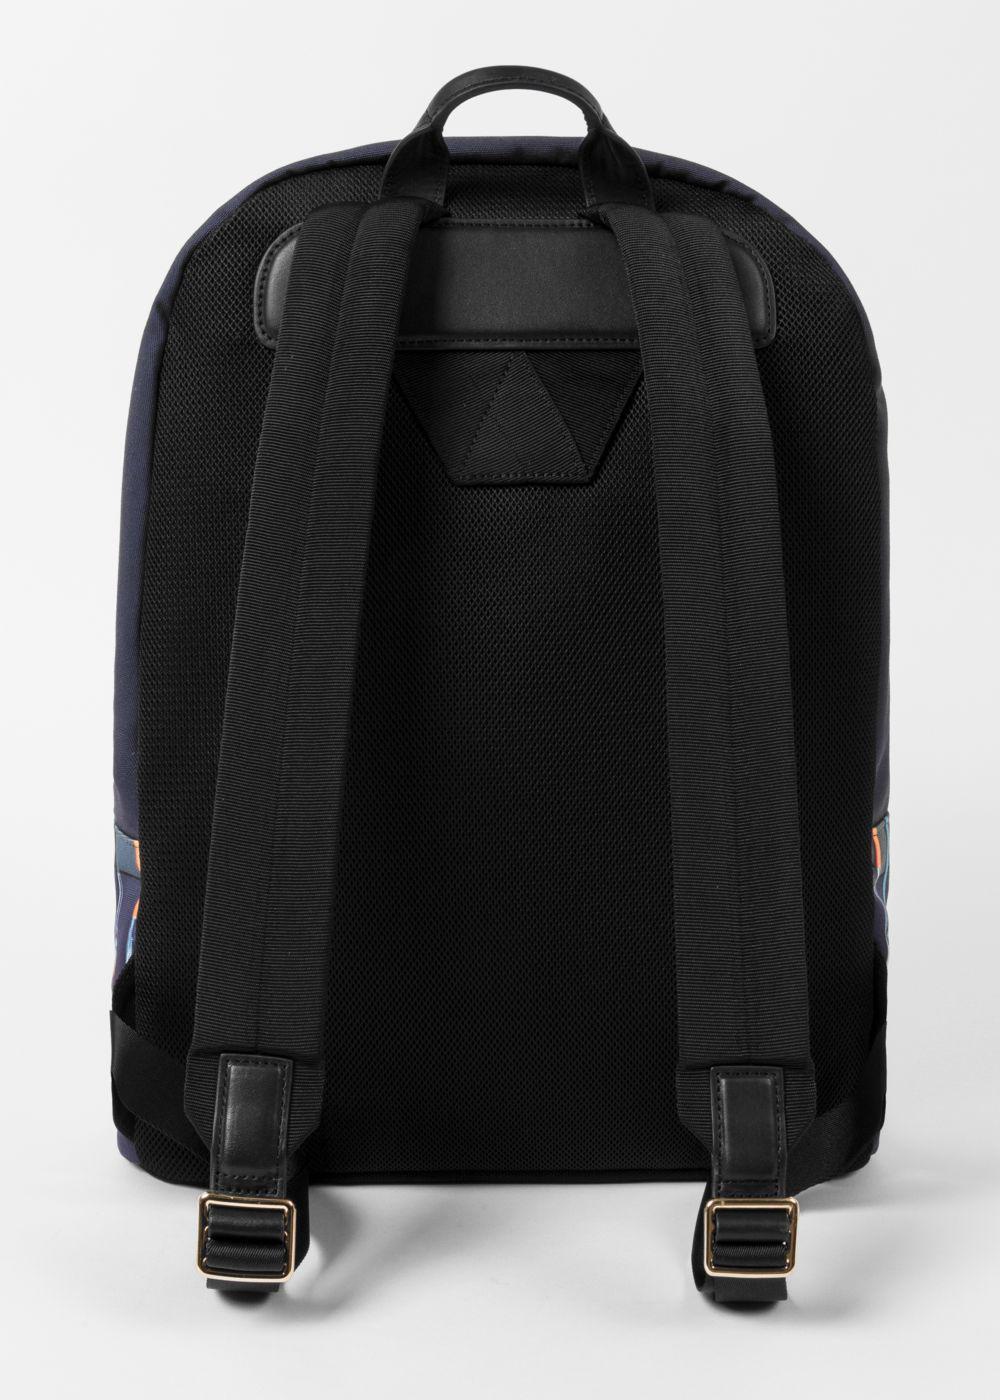 Paul Smith Men's Canvas 'Paint Brush' Print Backpack in Black for Men